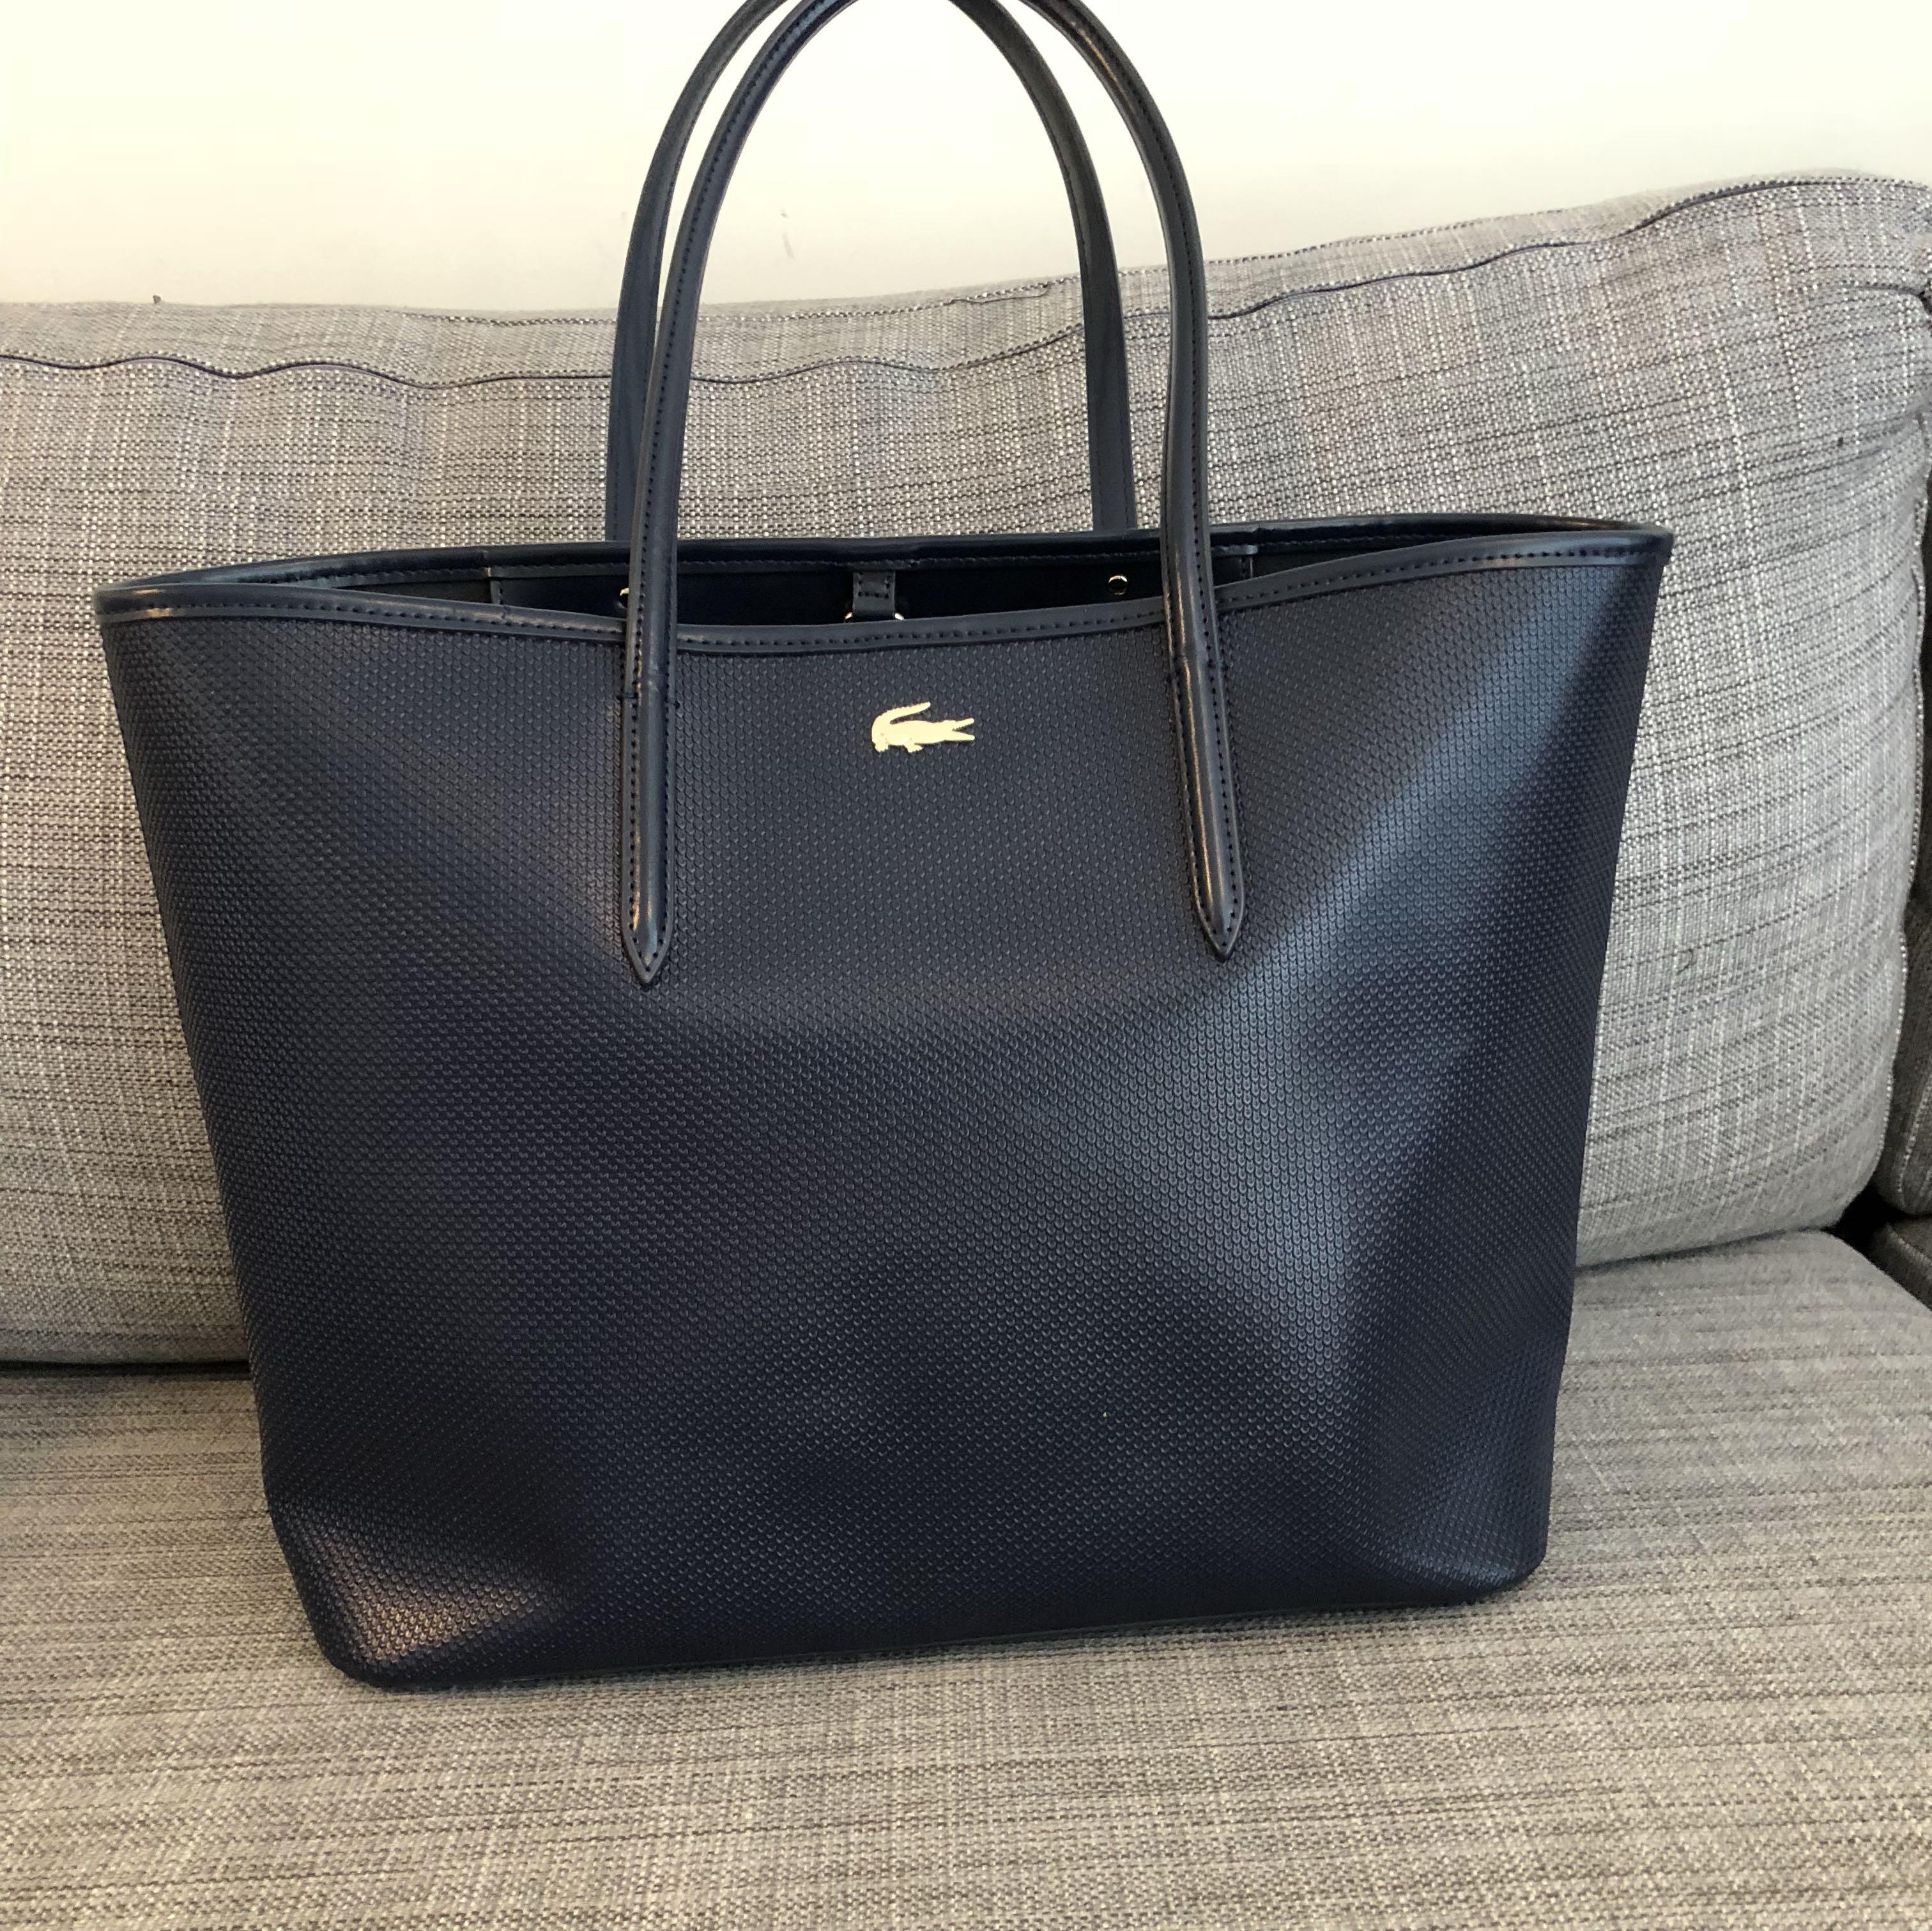 8132b61356b Lacoste Navy Chantaco Pique Leather Tote, Women's Fashion, Bags ...